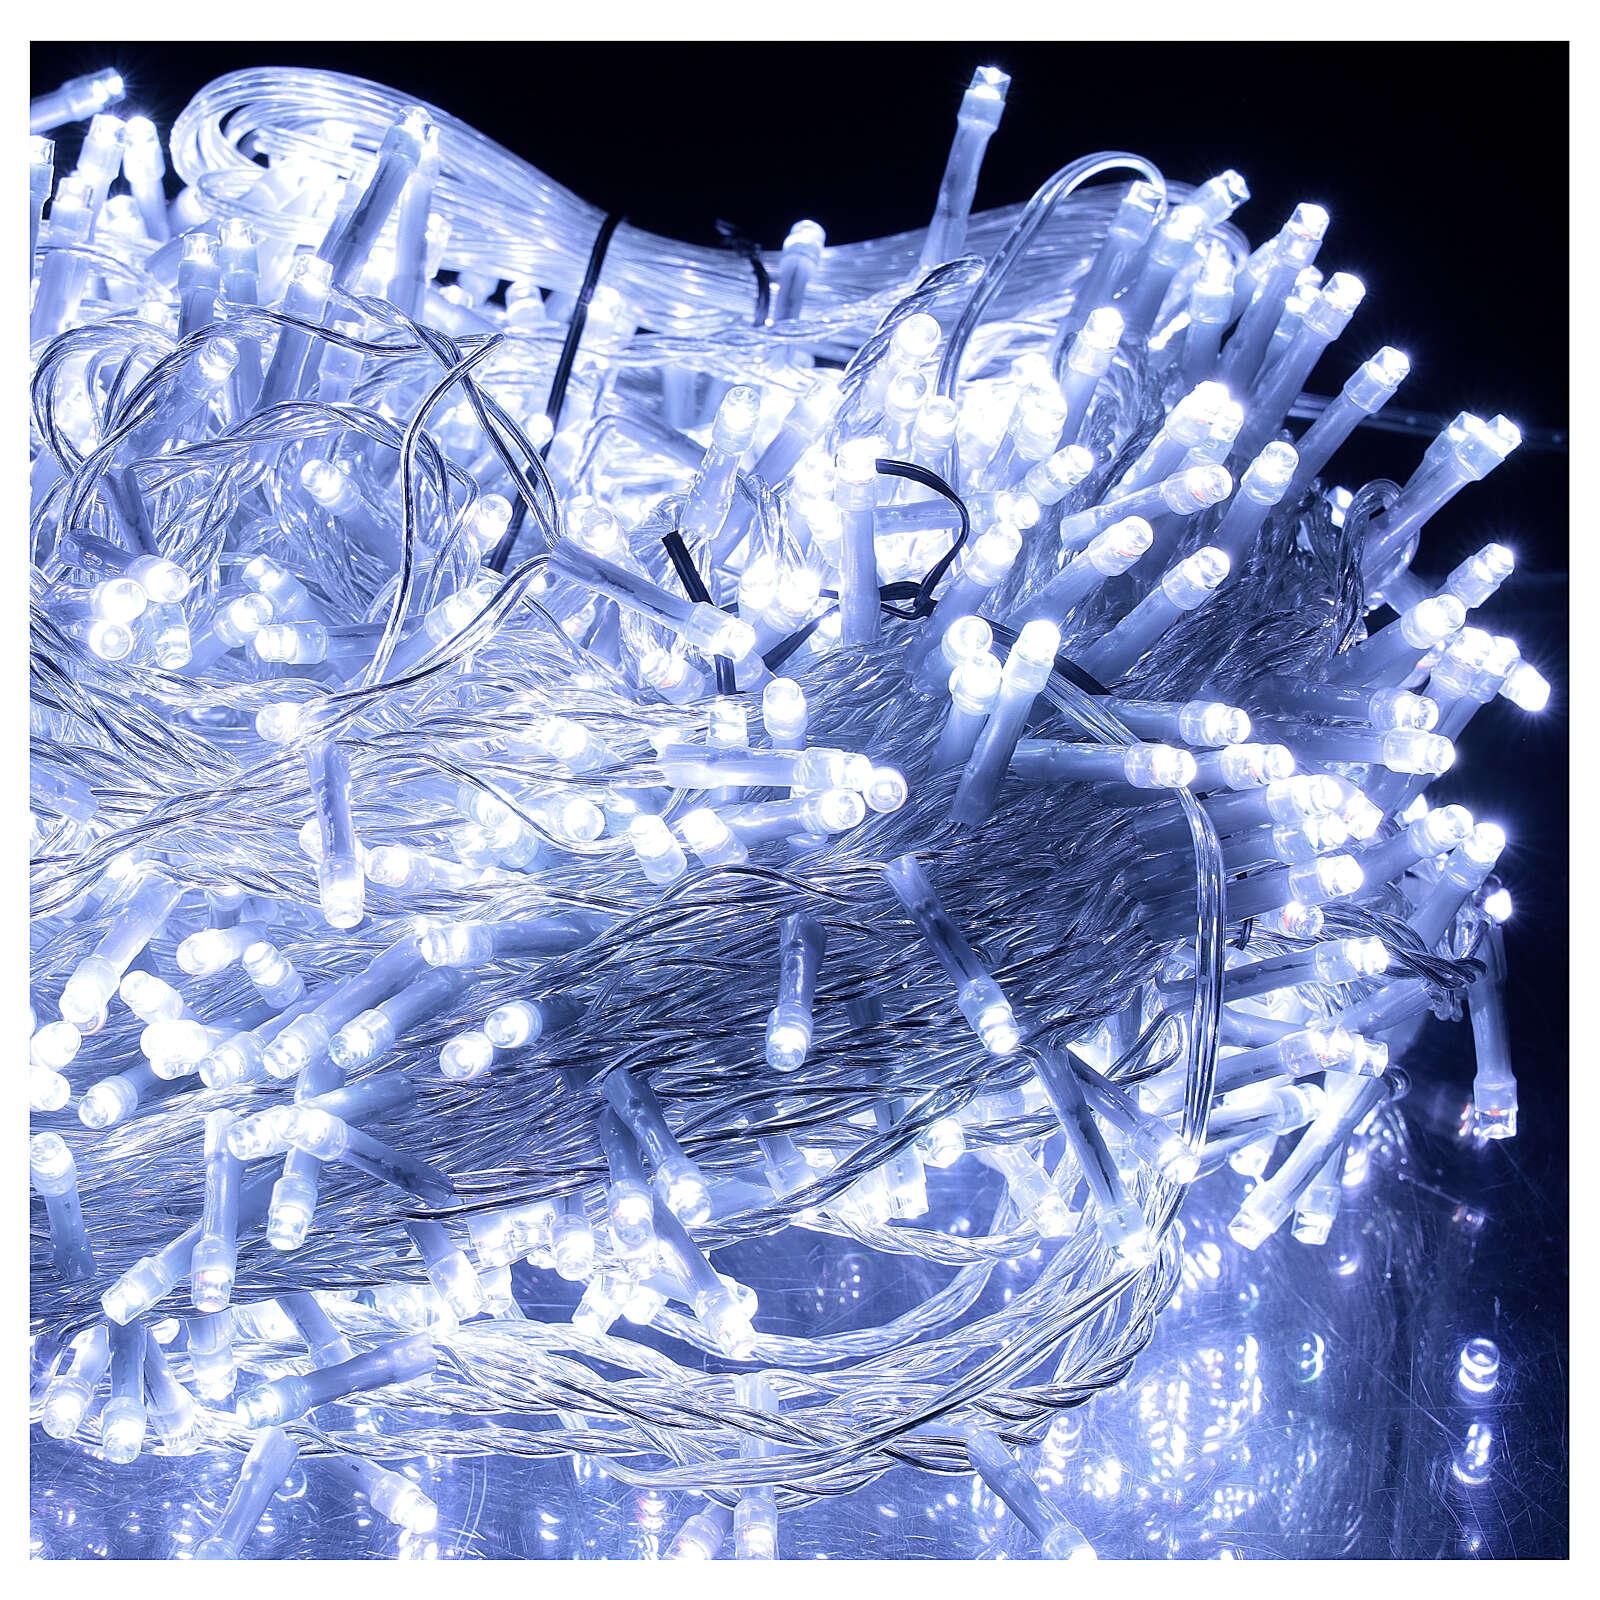 Catena luminosa 800 led 2 in 1 bianco freddo multicolor 56 m int est 3